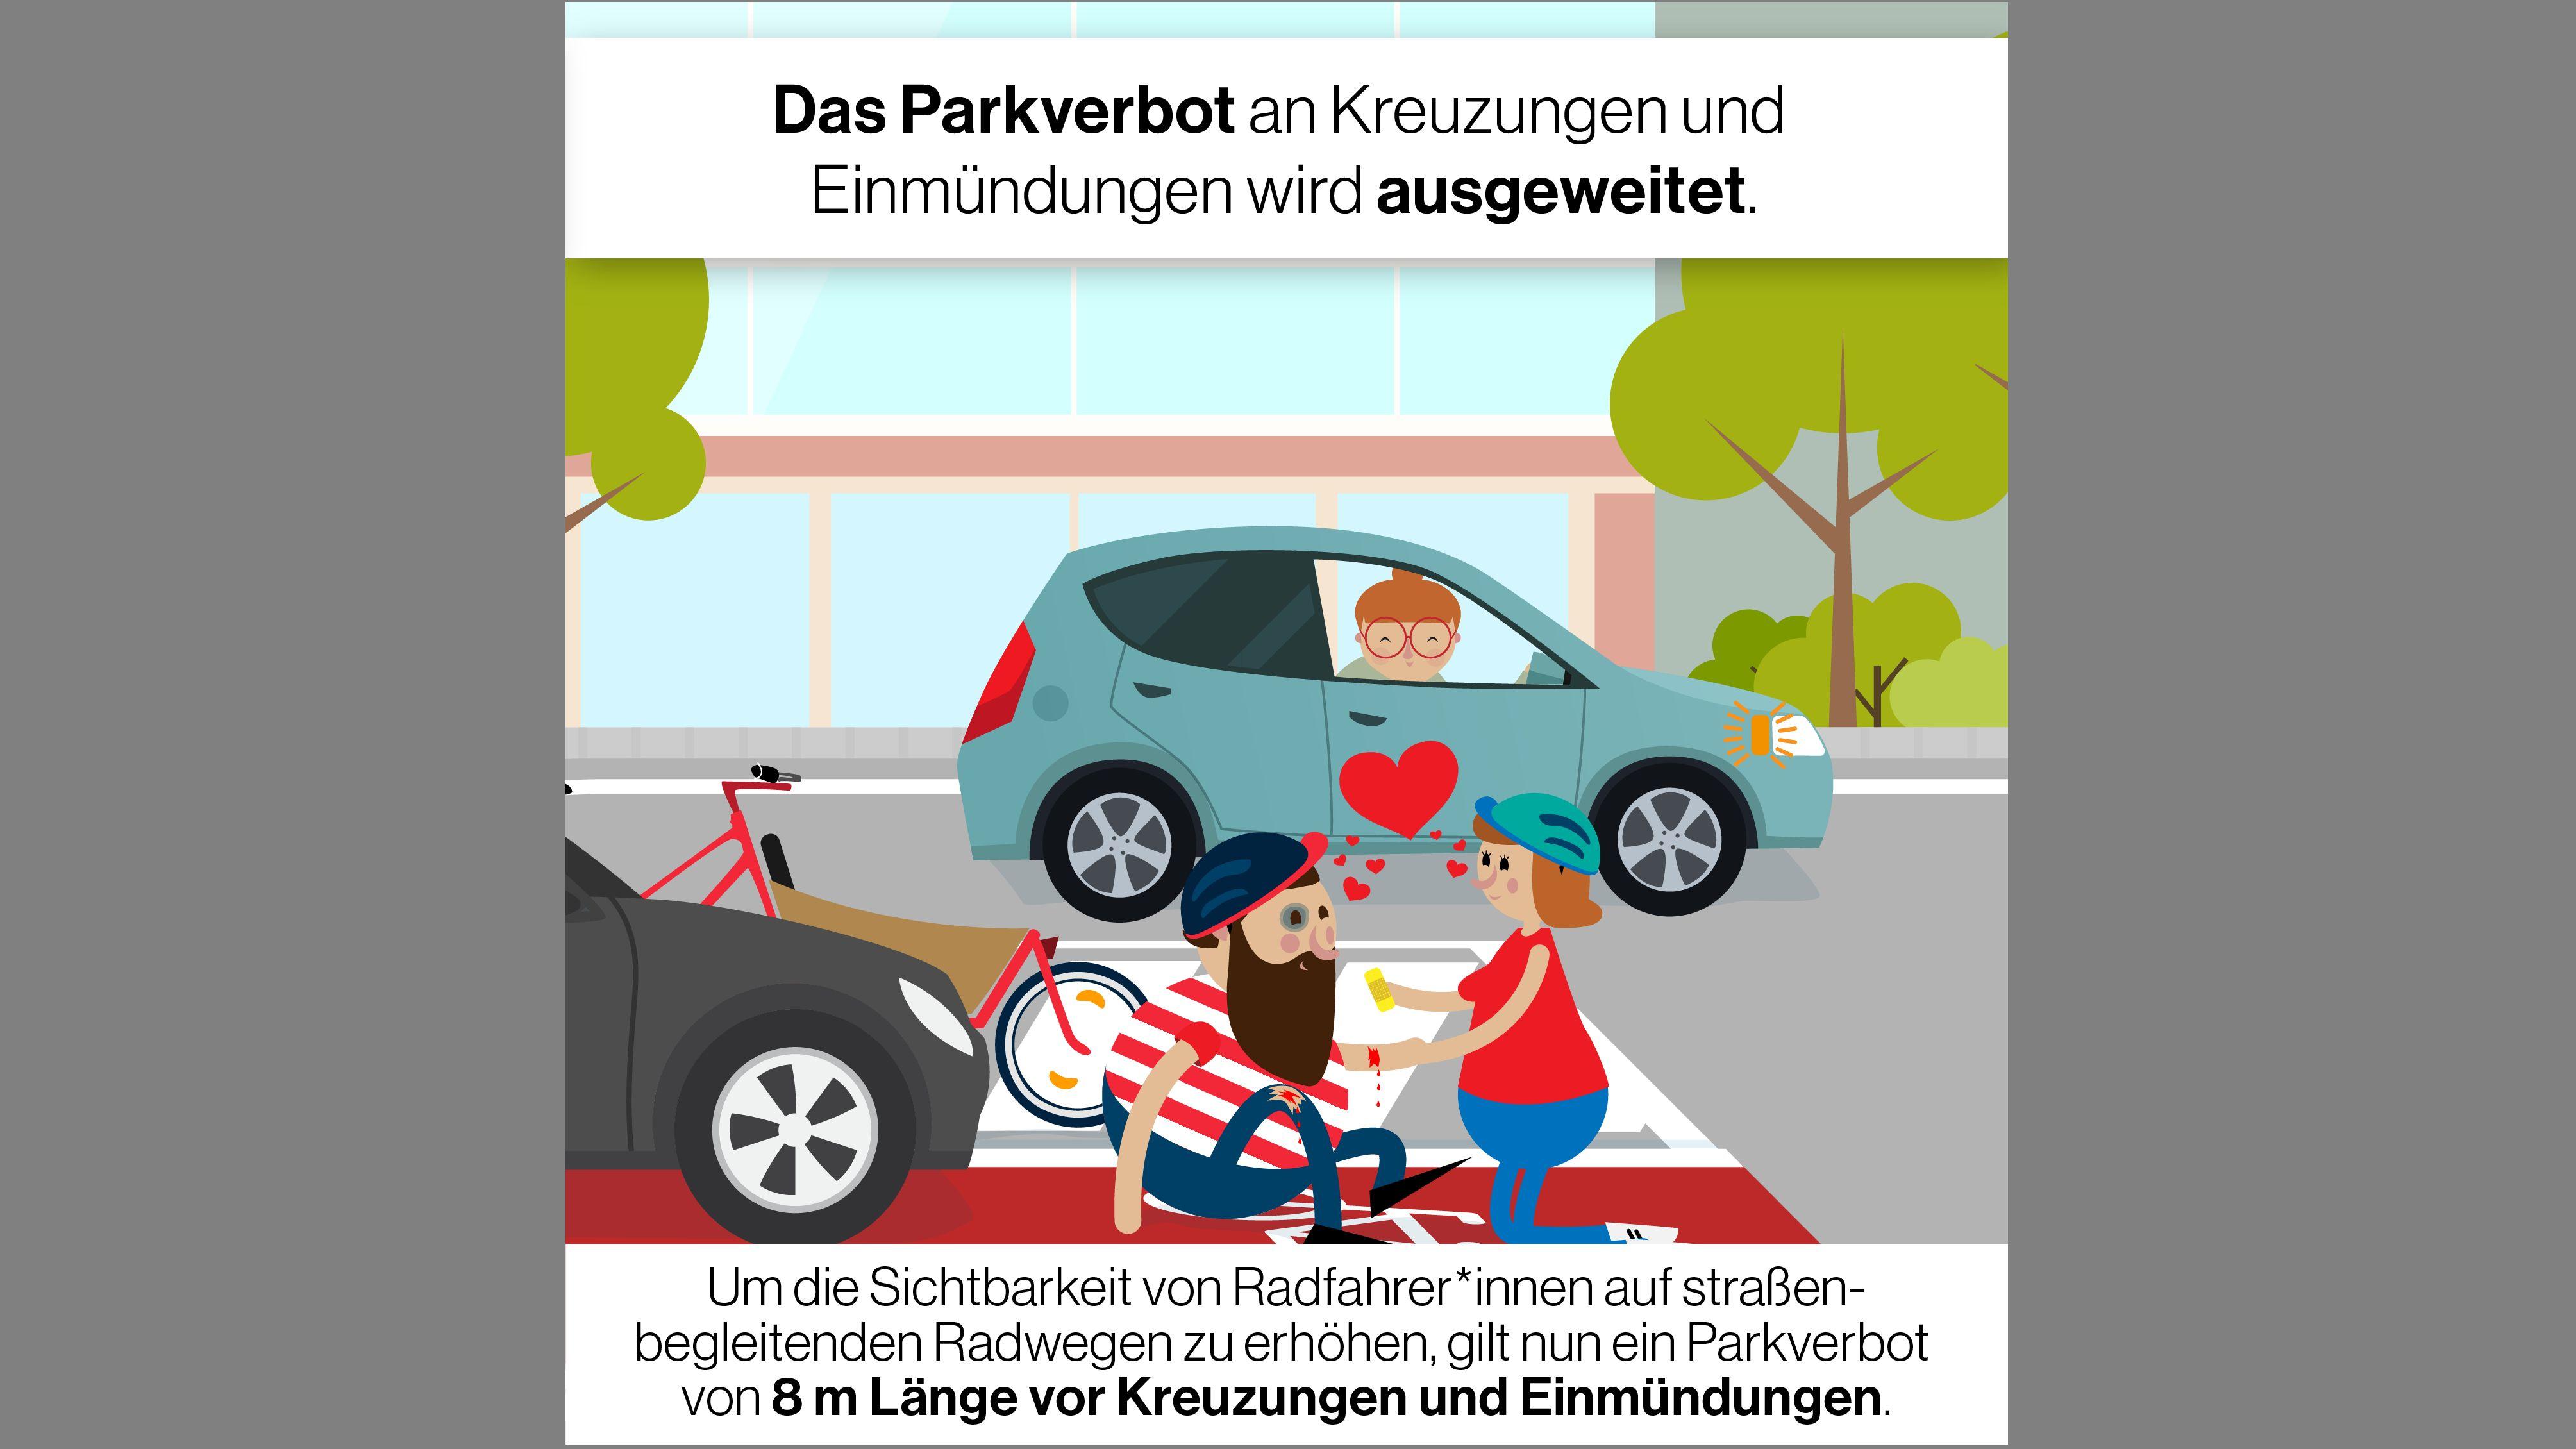 Grafik: Parkverbot an Kreuzungen und Einmündungen